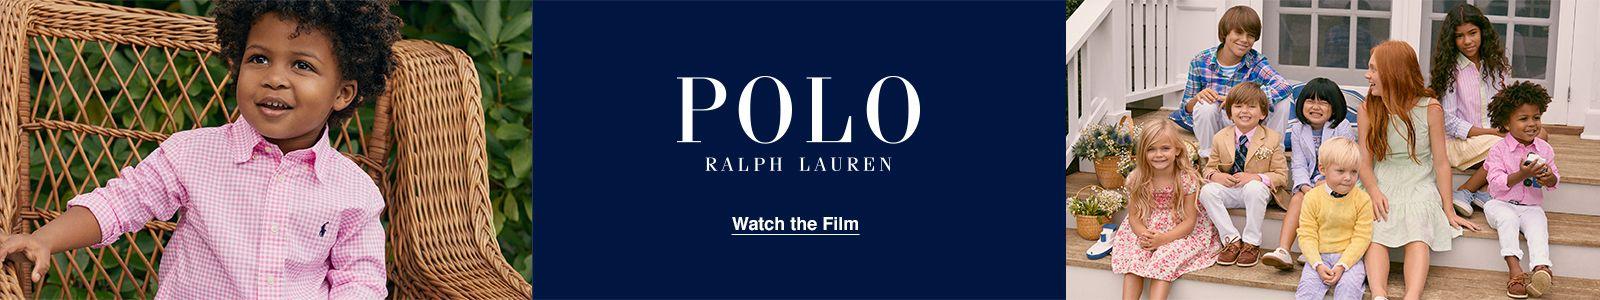 Polo, Ralph Lauren, Watch the Flim